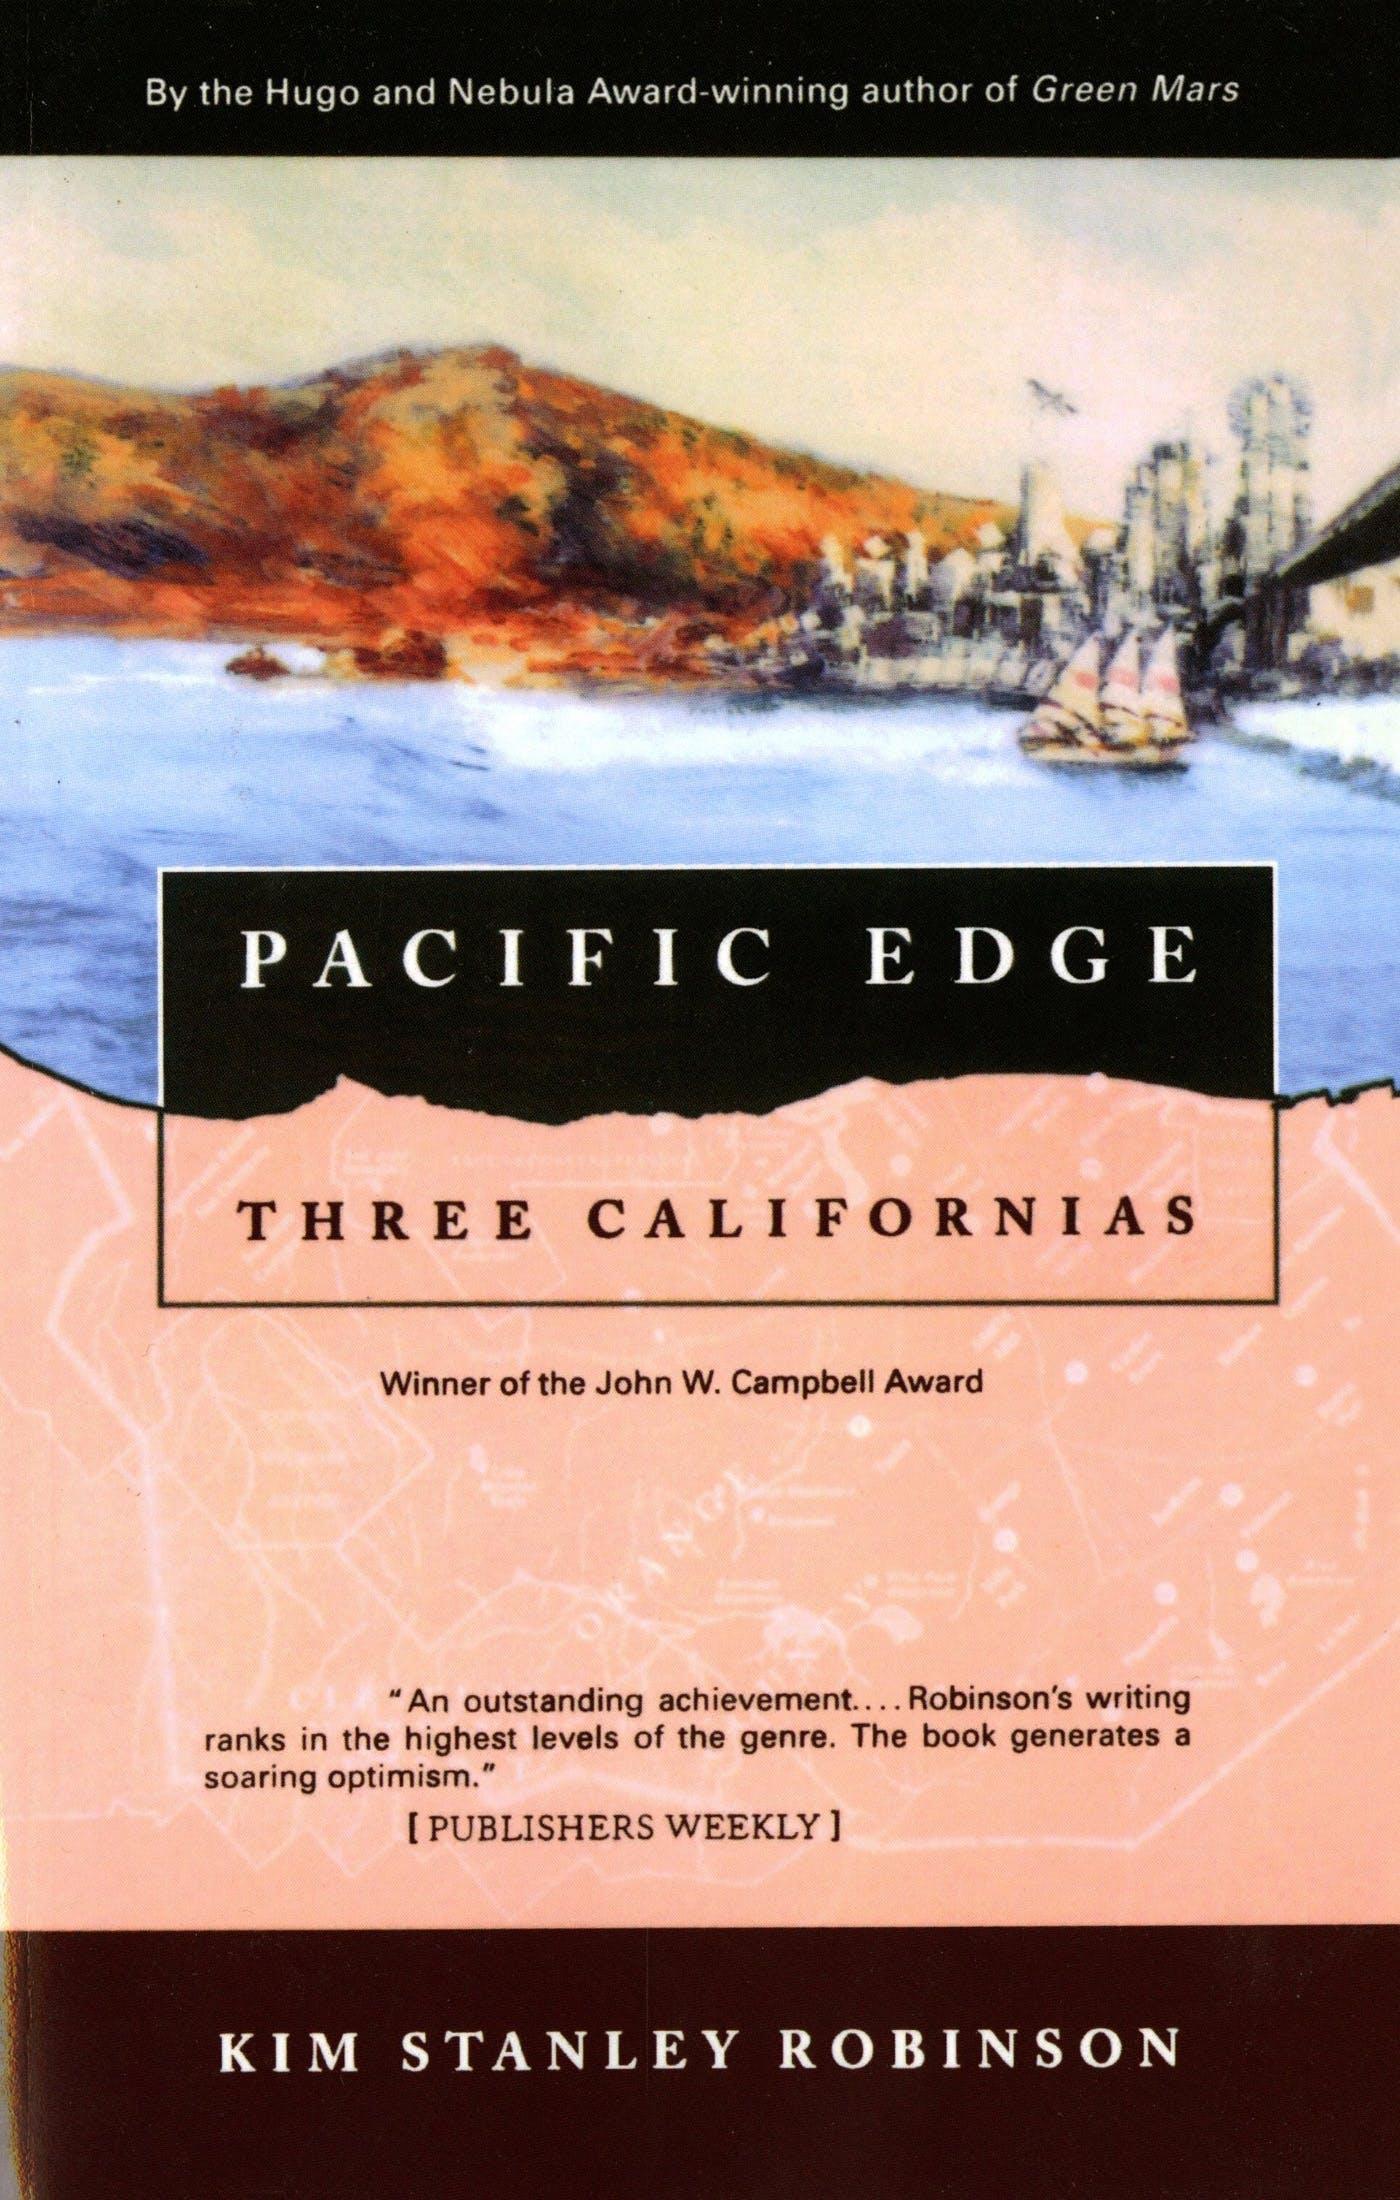 Image of Pacific Edge